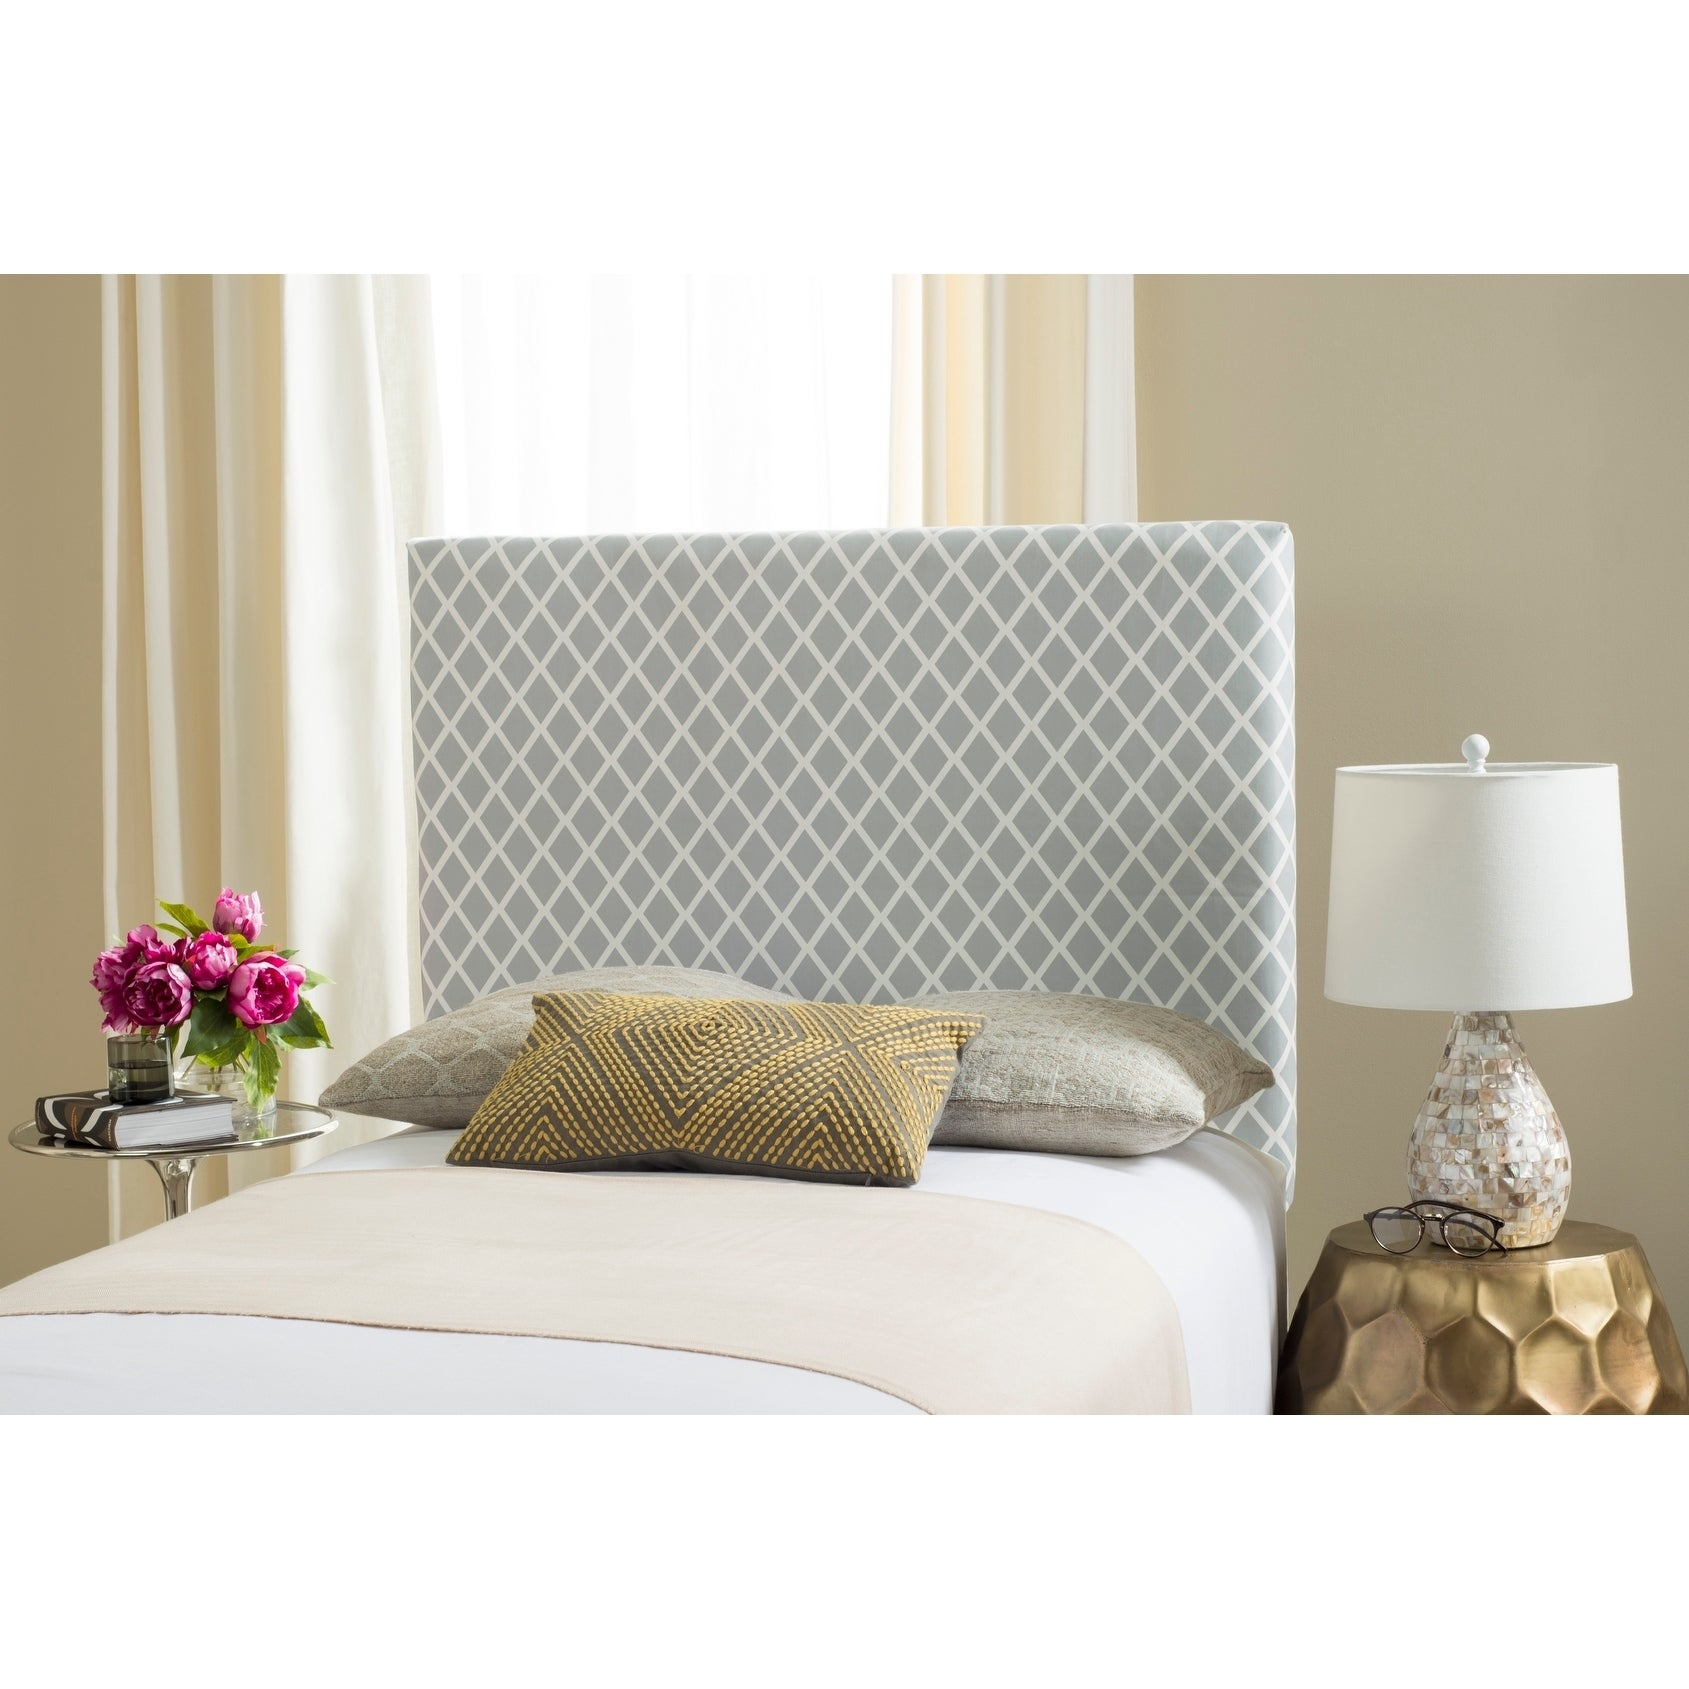 Safavieh Sydney Grey/ White Lattice Upholstered Headboard...